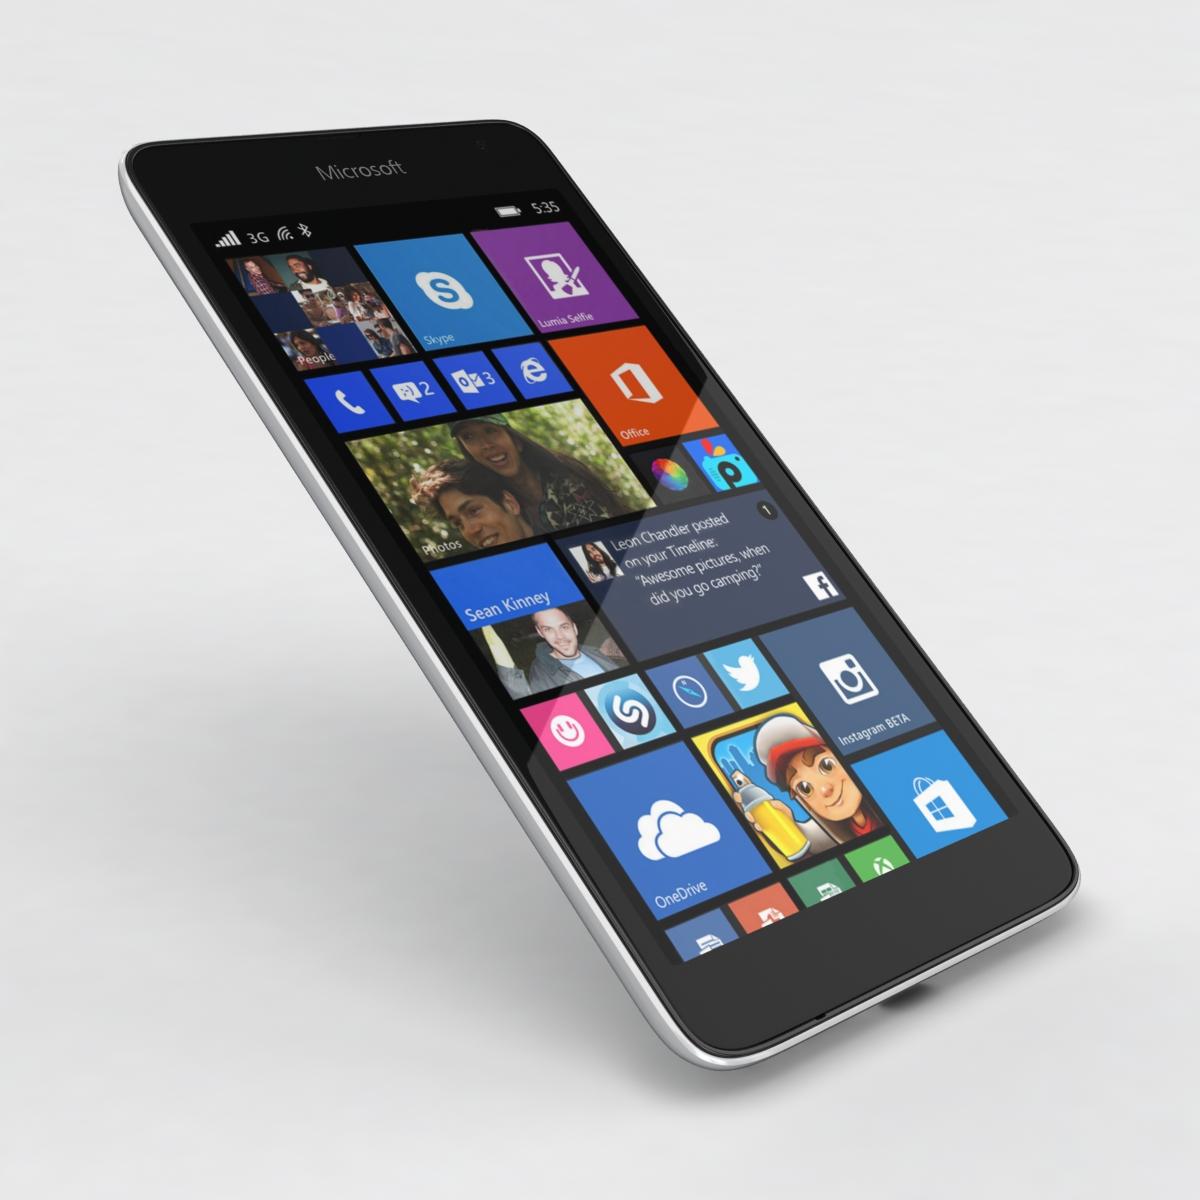 microsoft lumia 535 and dual sim white 3d model 3ds max fbx c4d obj 204291